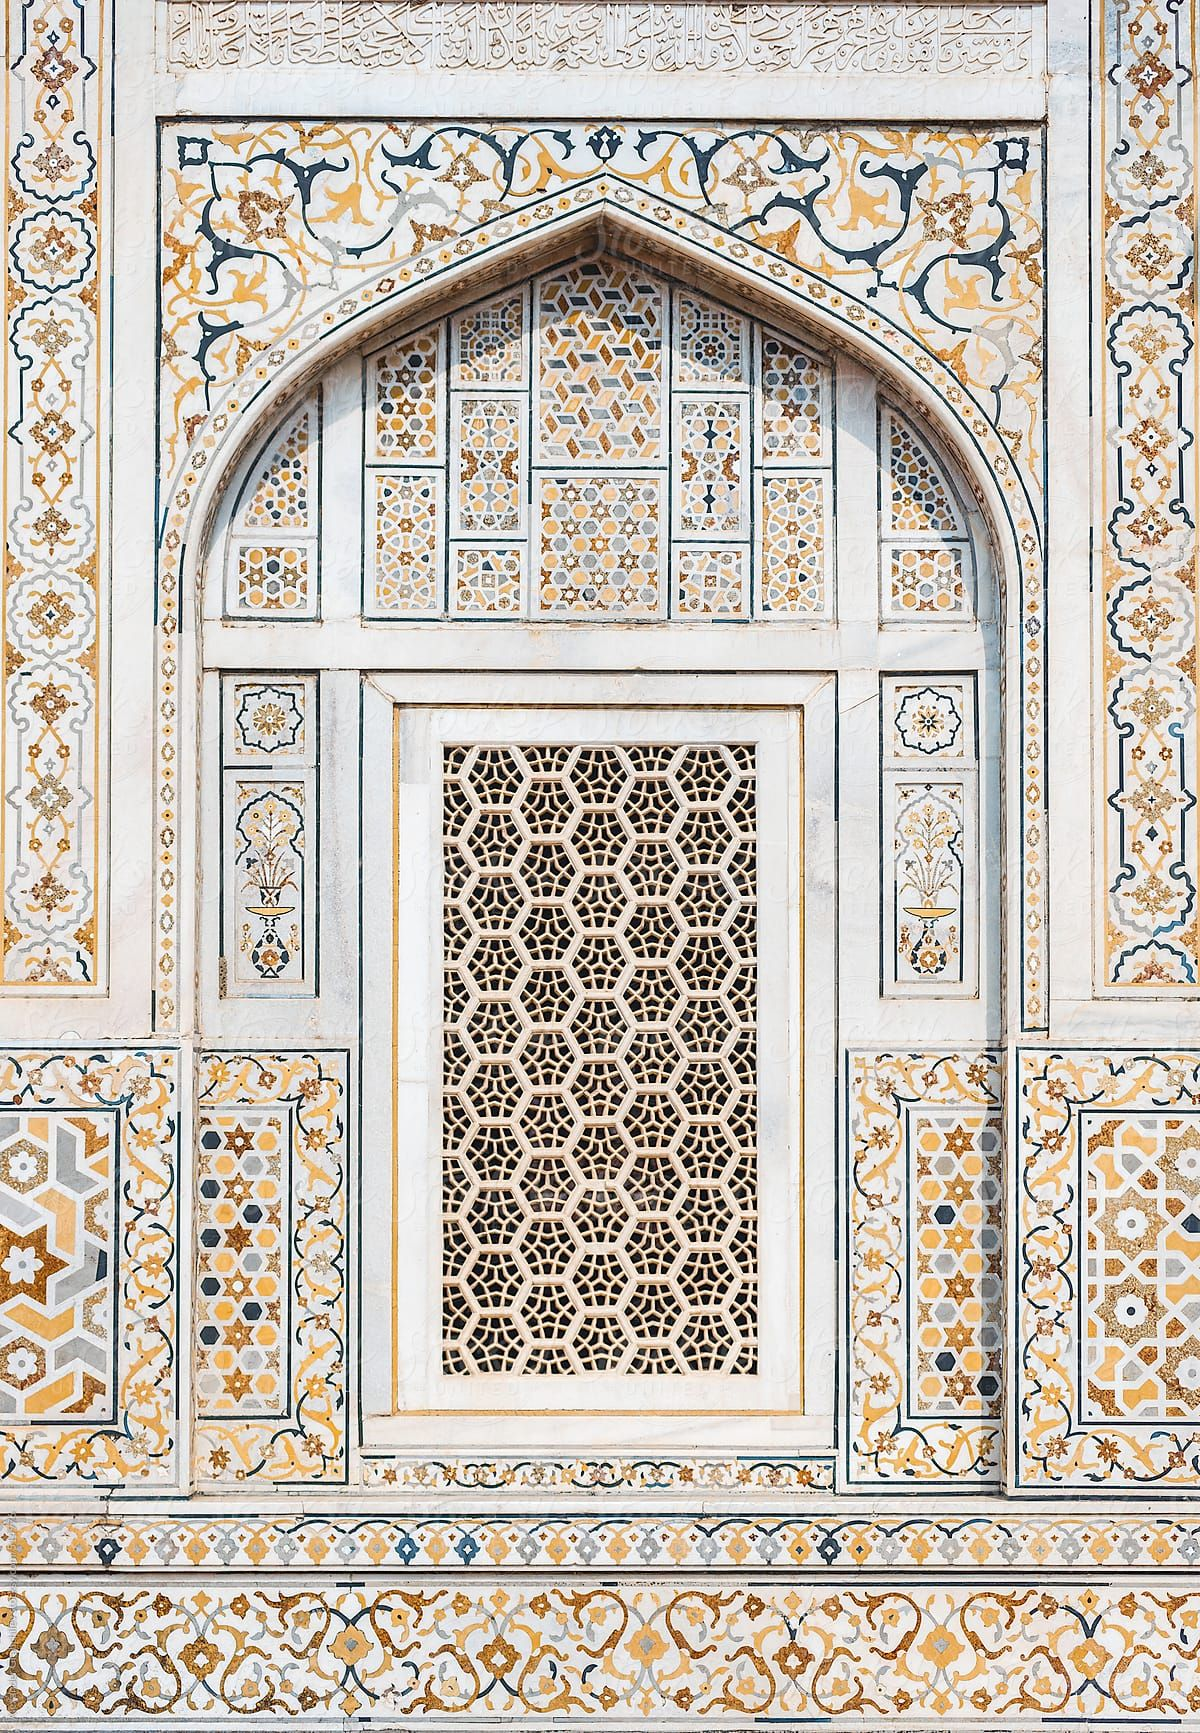 Arabic Mosaic Pattern Window by Alexander Grabchilev  - Stocksy United